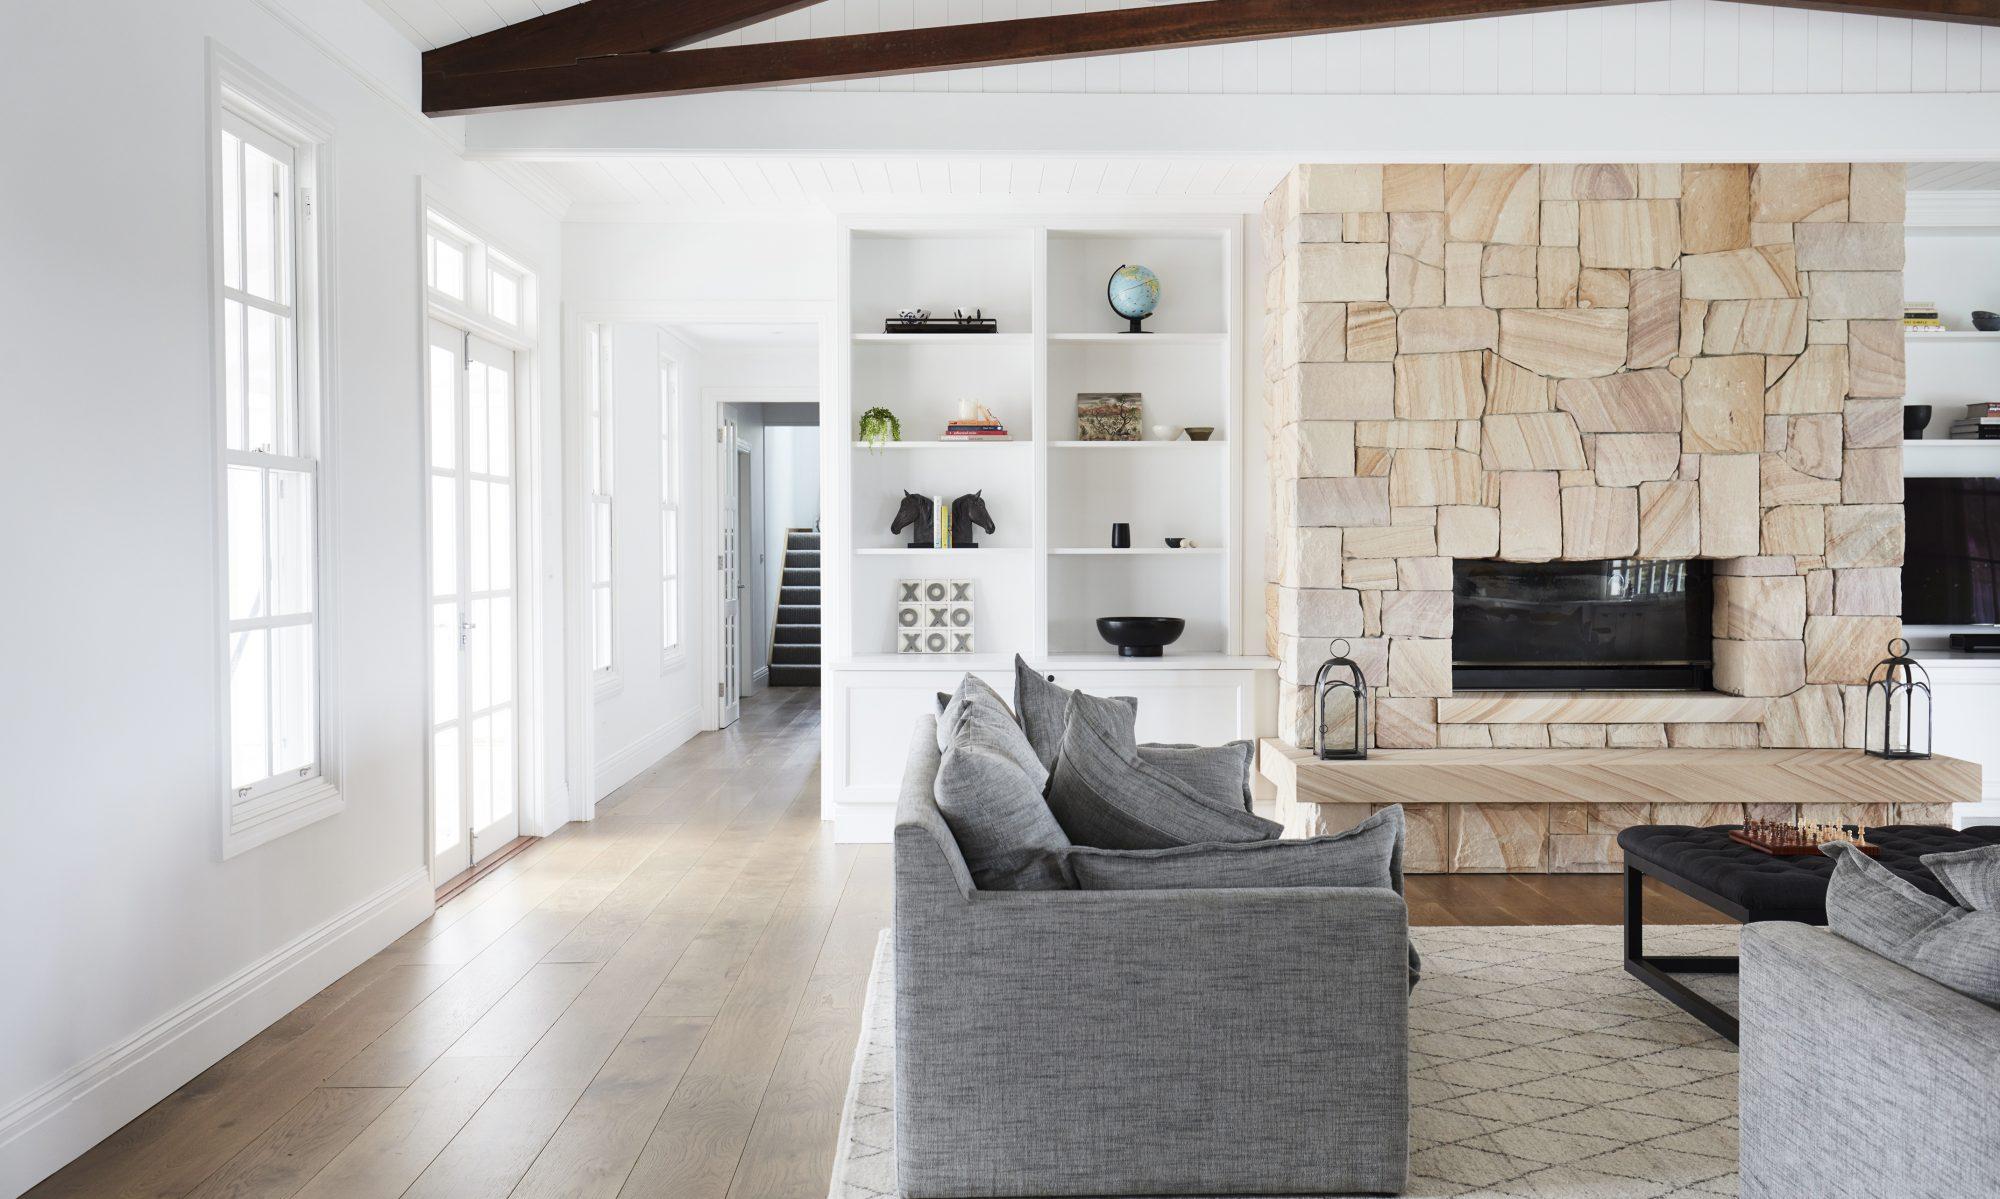 siobhann studio | interiors